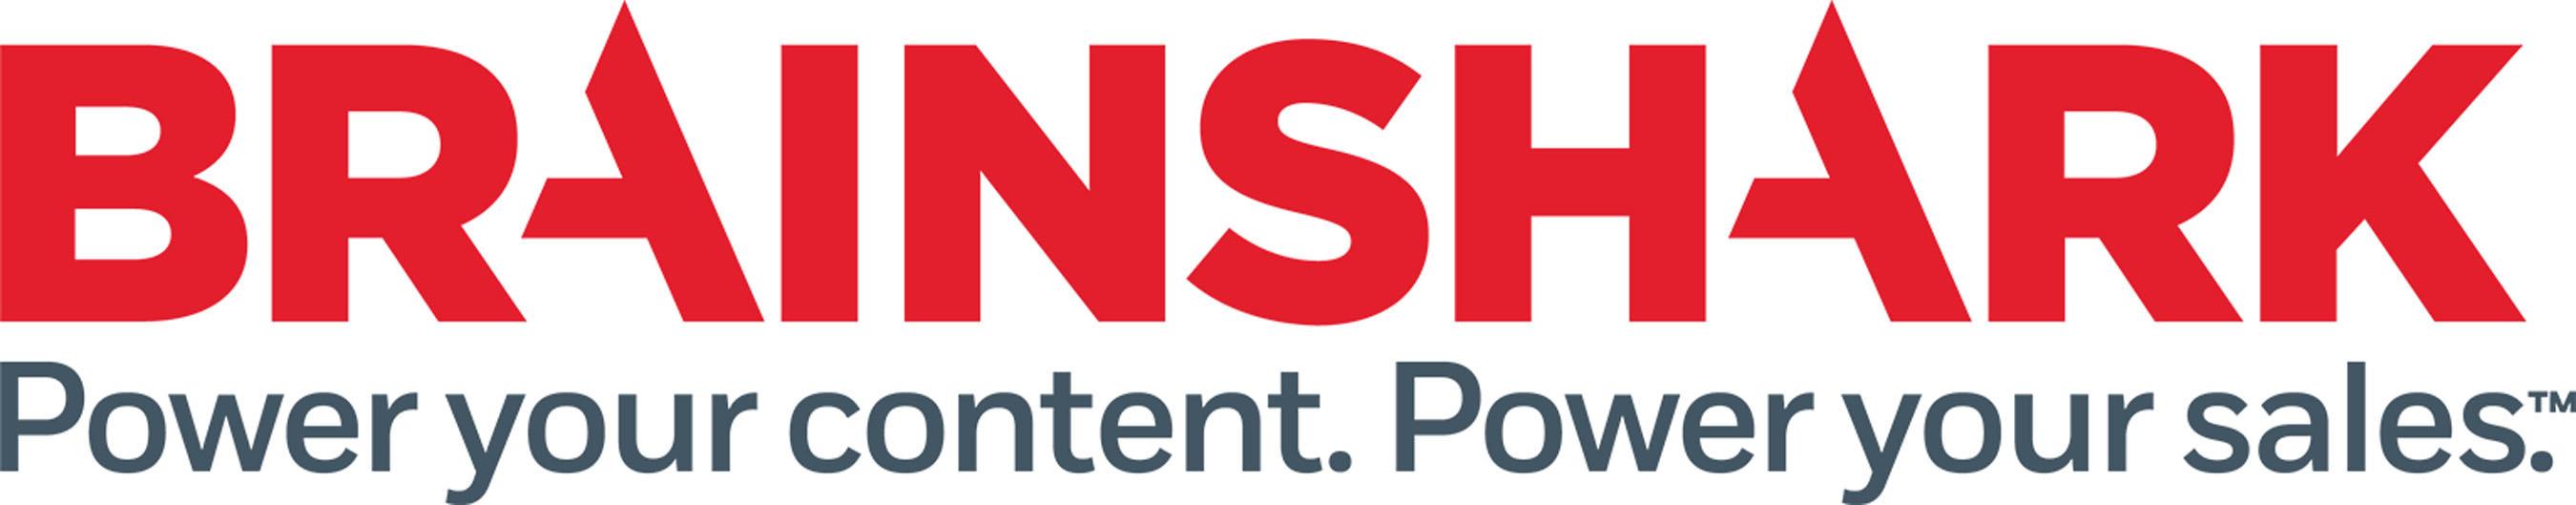 Brainshark, Inc. is the leader in online and mobile video presentations. www.brainshark.com.